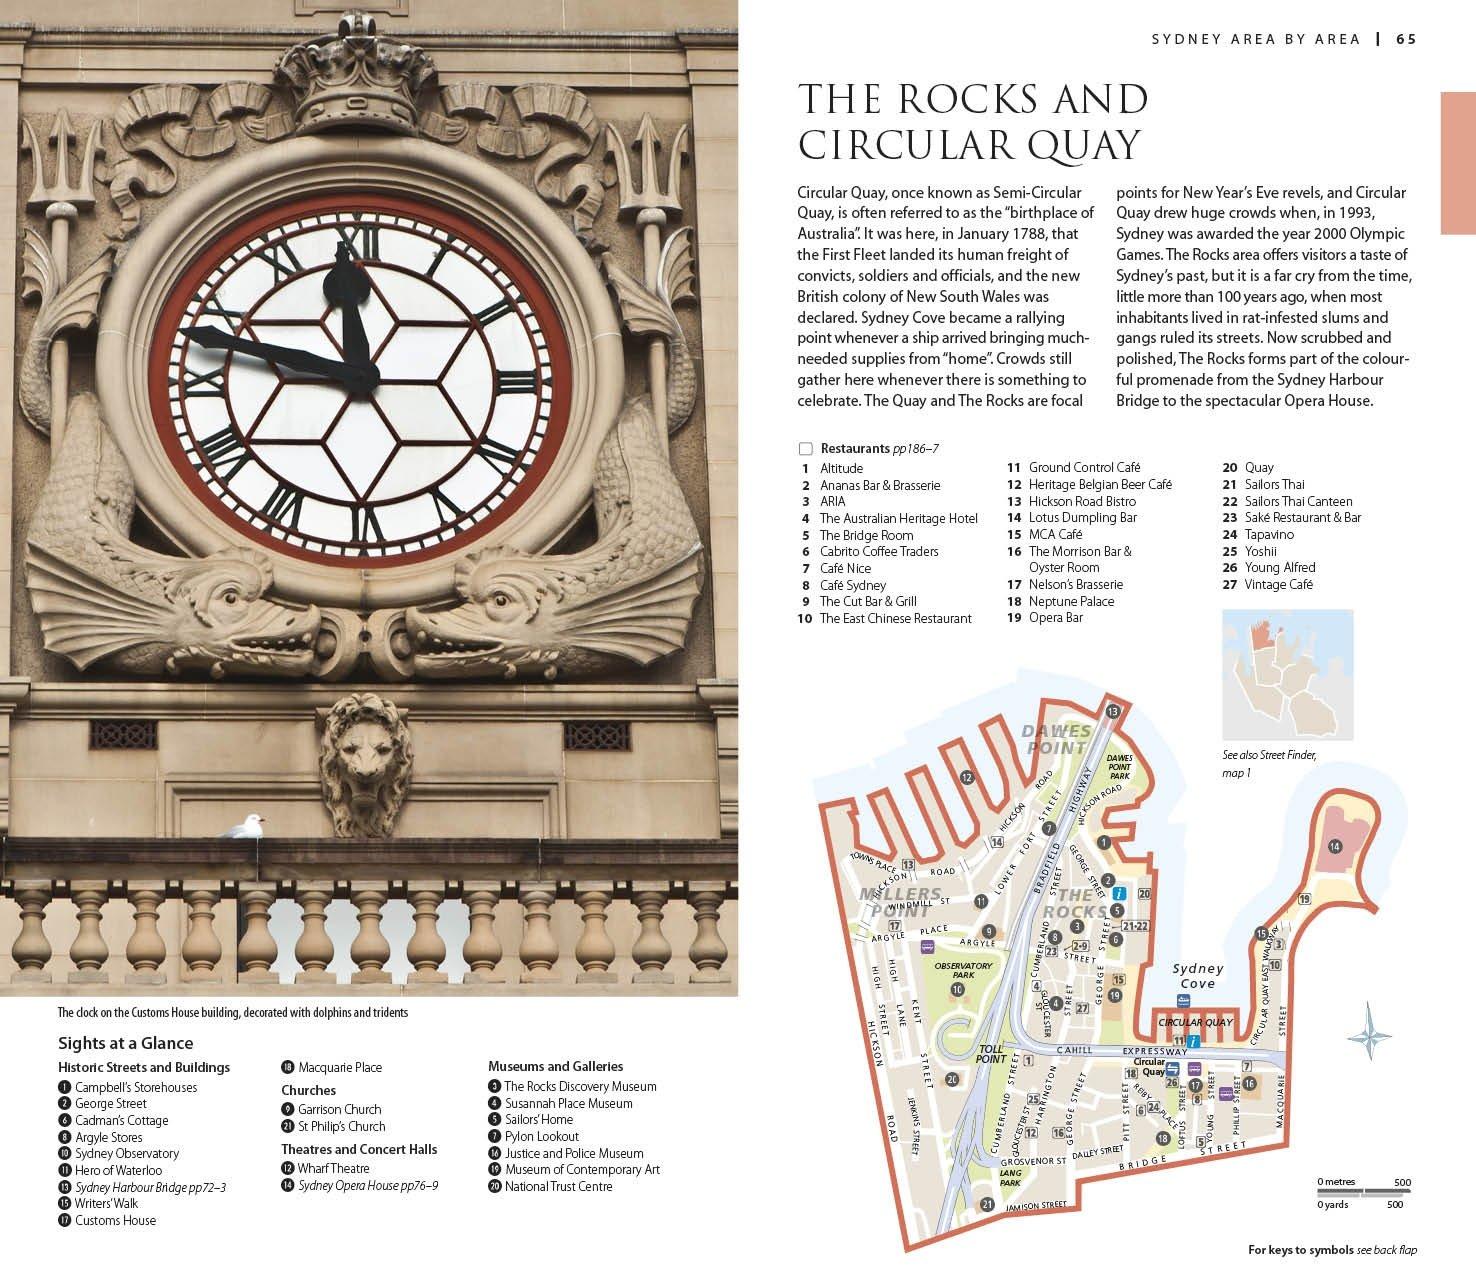 DK Eyewitness Travel Guide Sydney - 81Yv - Getting Down Under